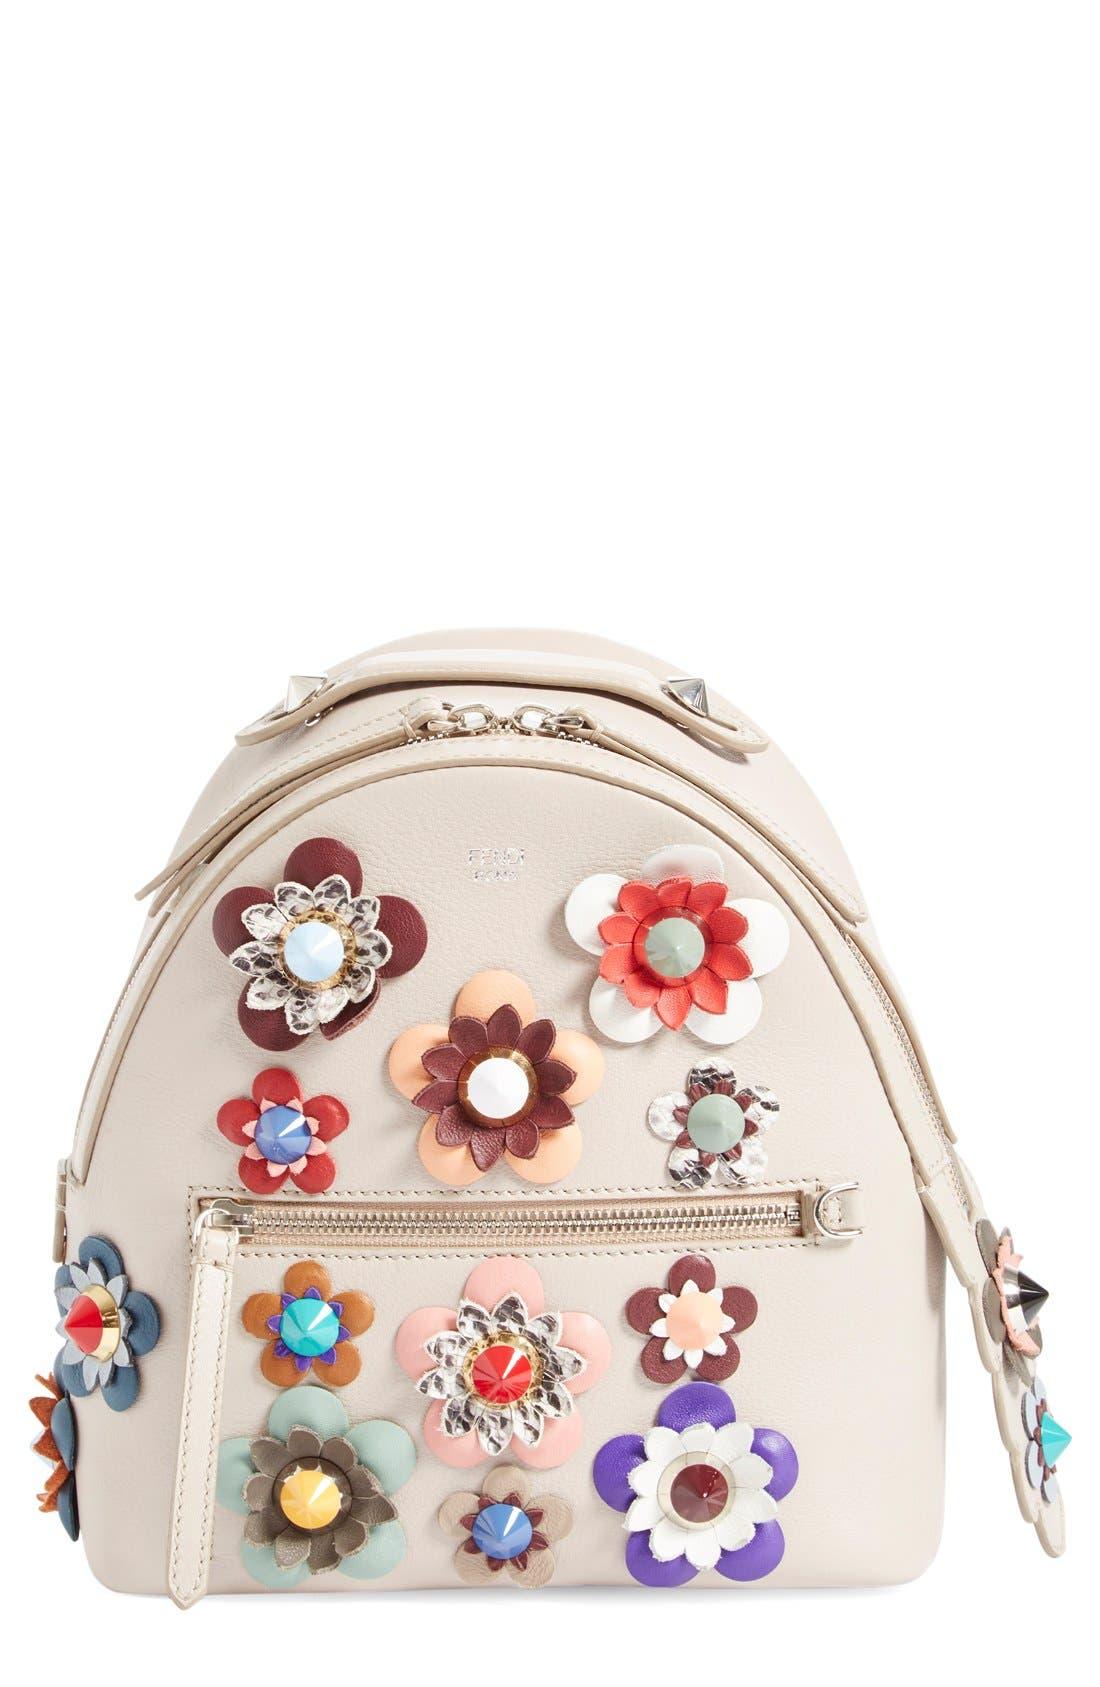 Alternate Image 1 Selected - Fendi Floral Appliqué Leather Mini Backpack